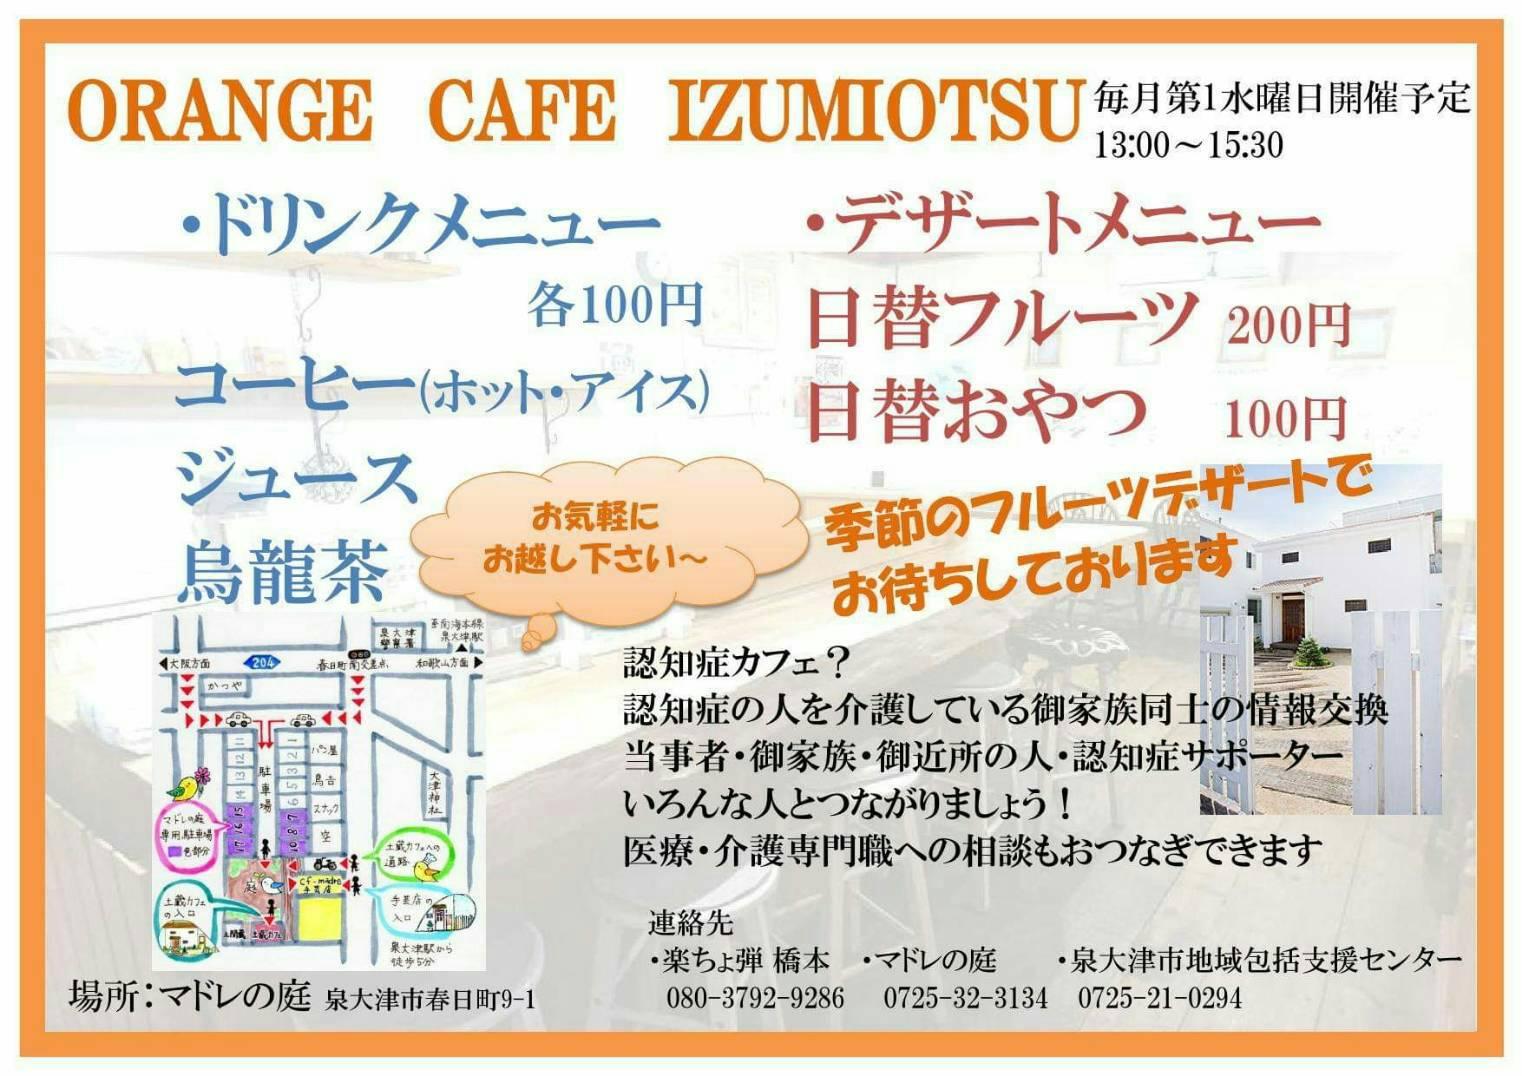 ORANGE CAFE IZUMIOTSU